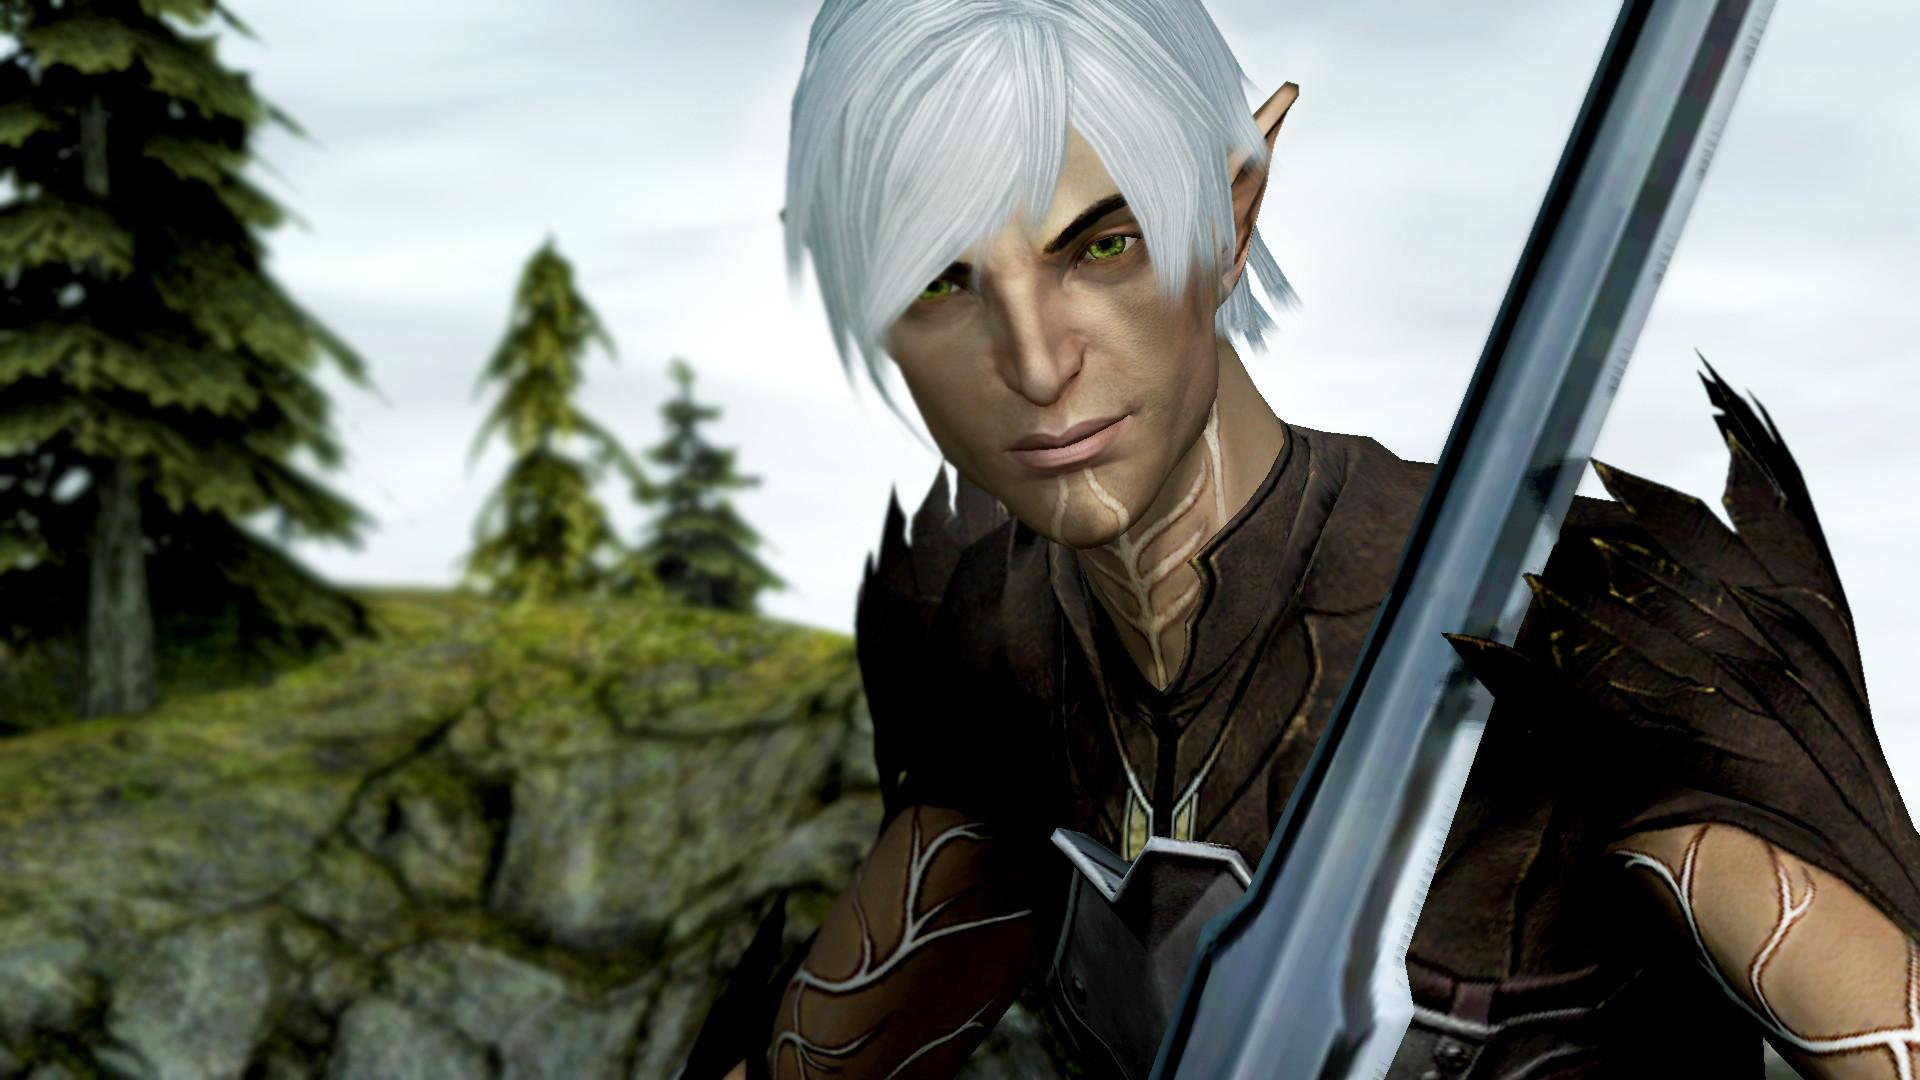 Fenris, Dragon Age 2 by amiima on DeviantArt